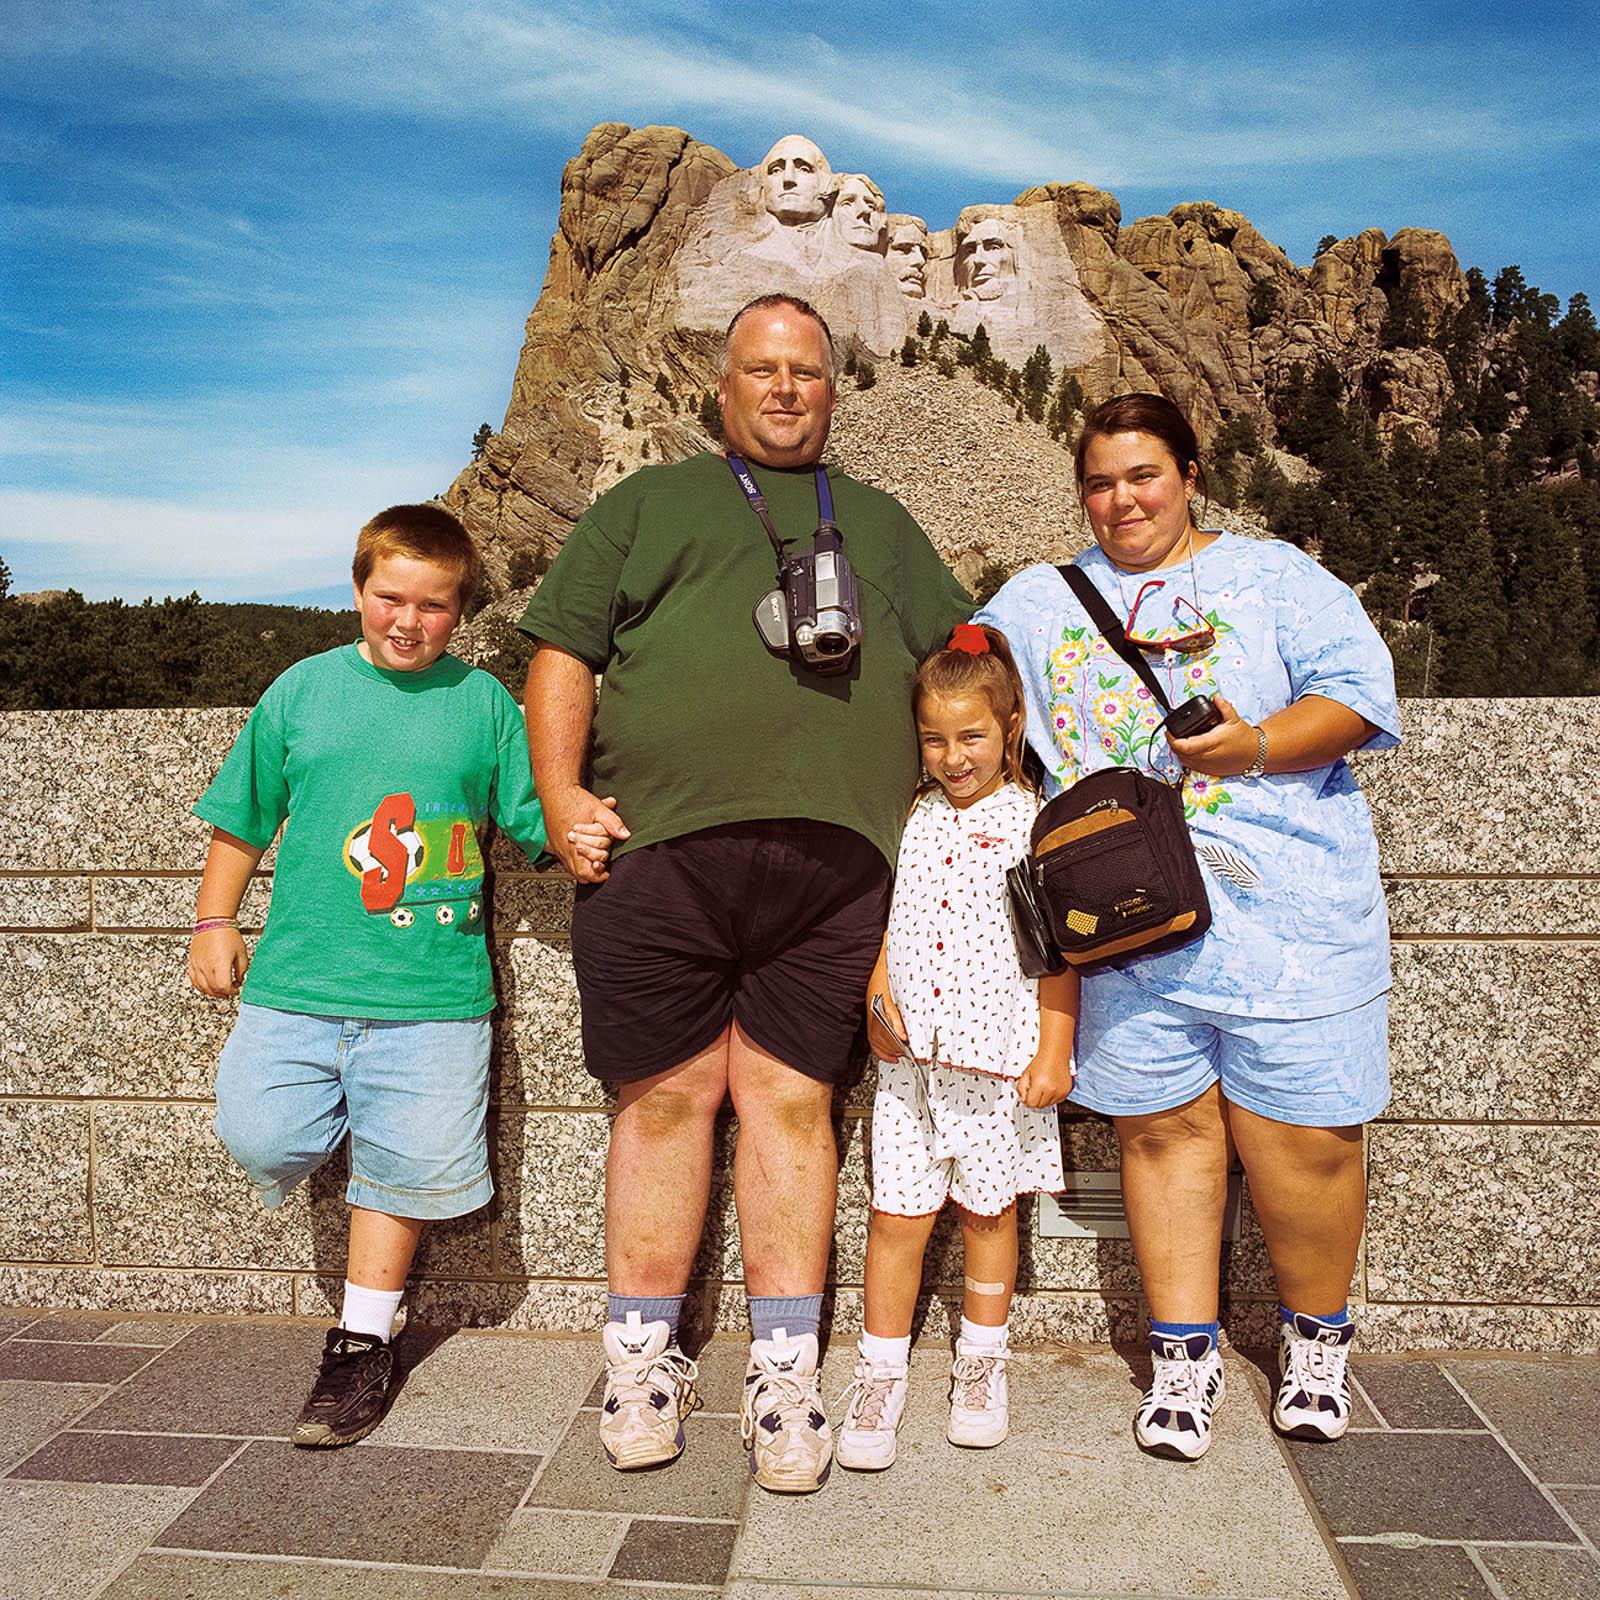 Family at Mt Rushmore, South Dakota 1998